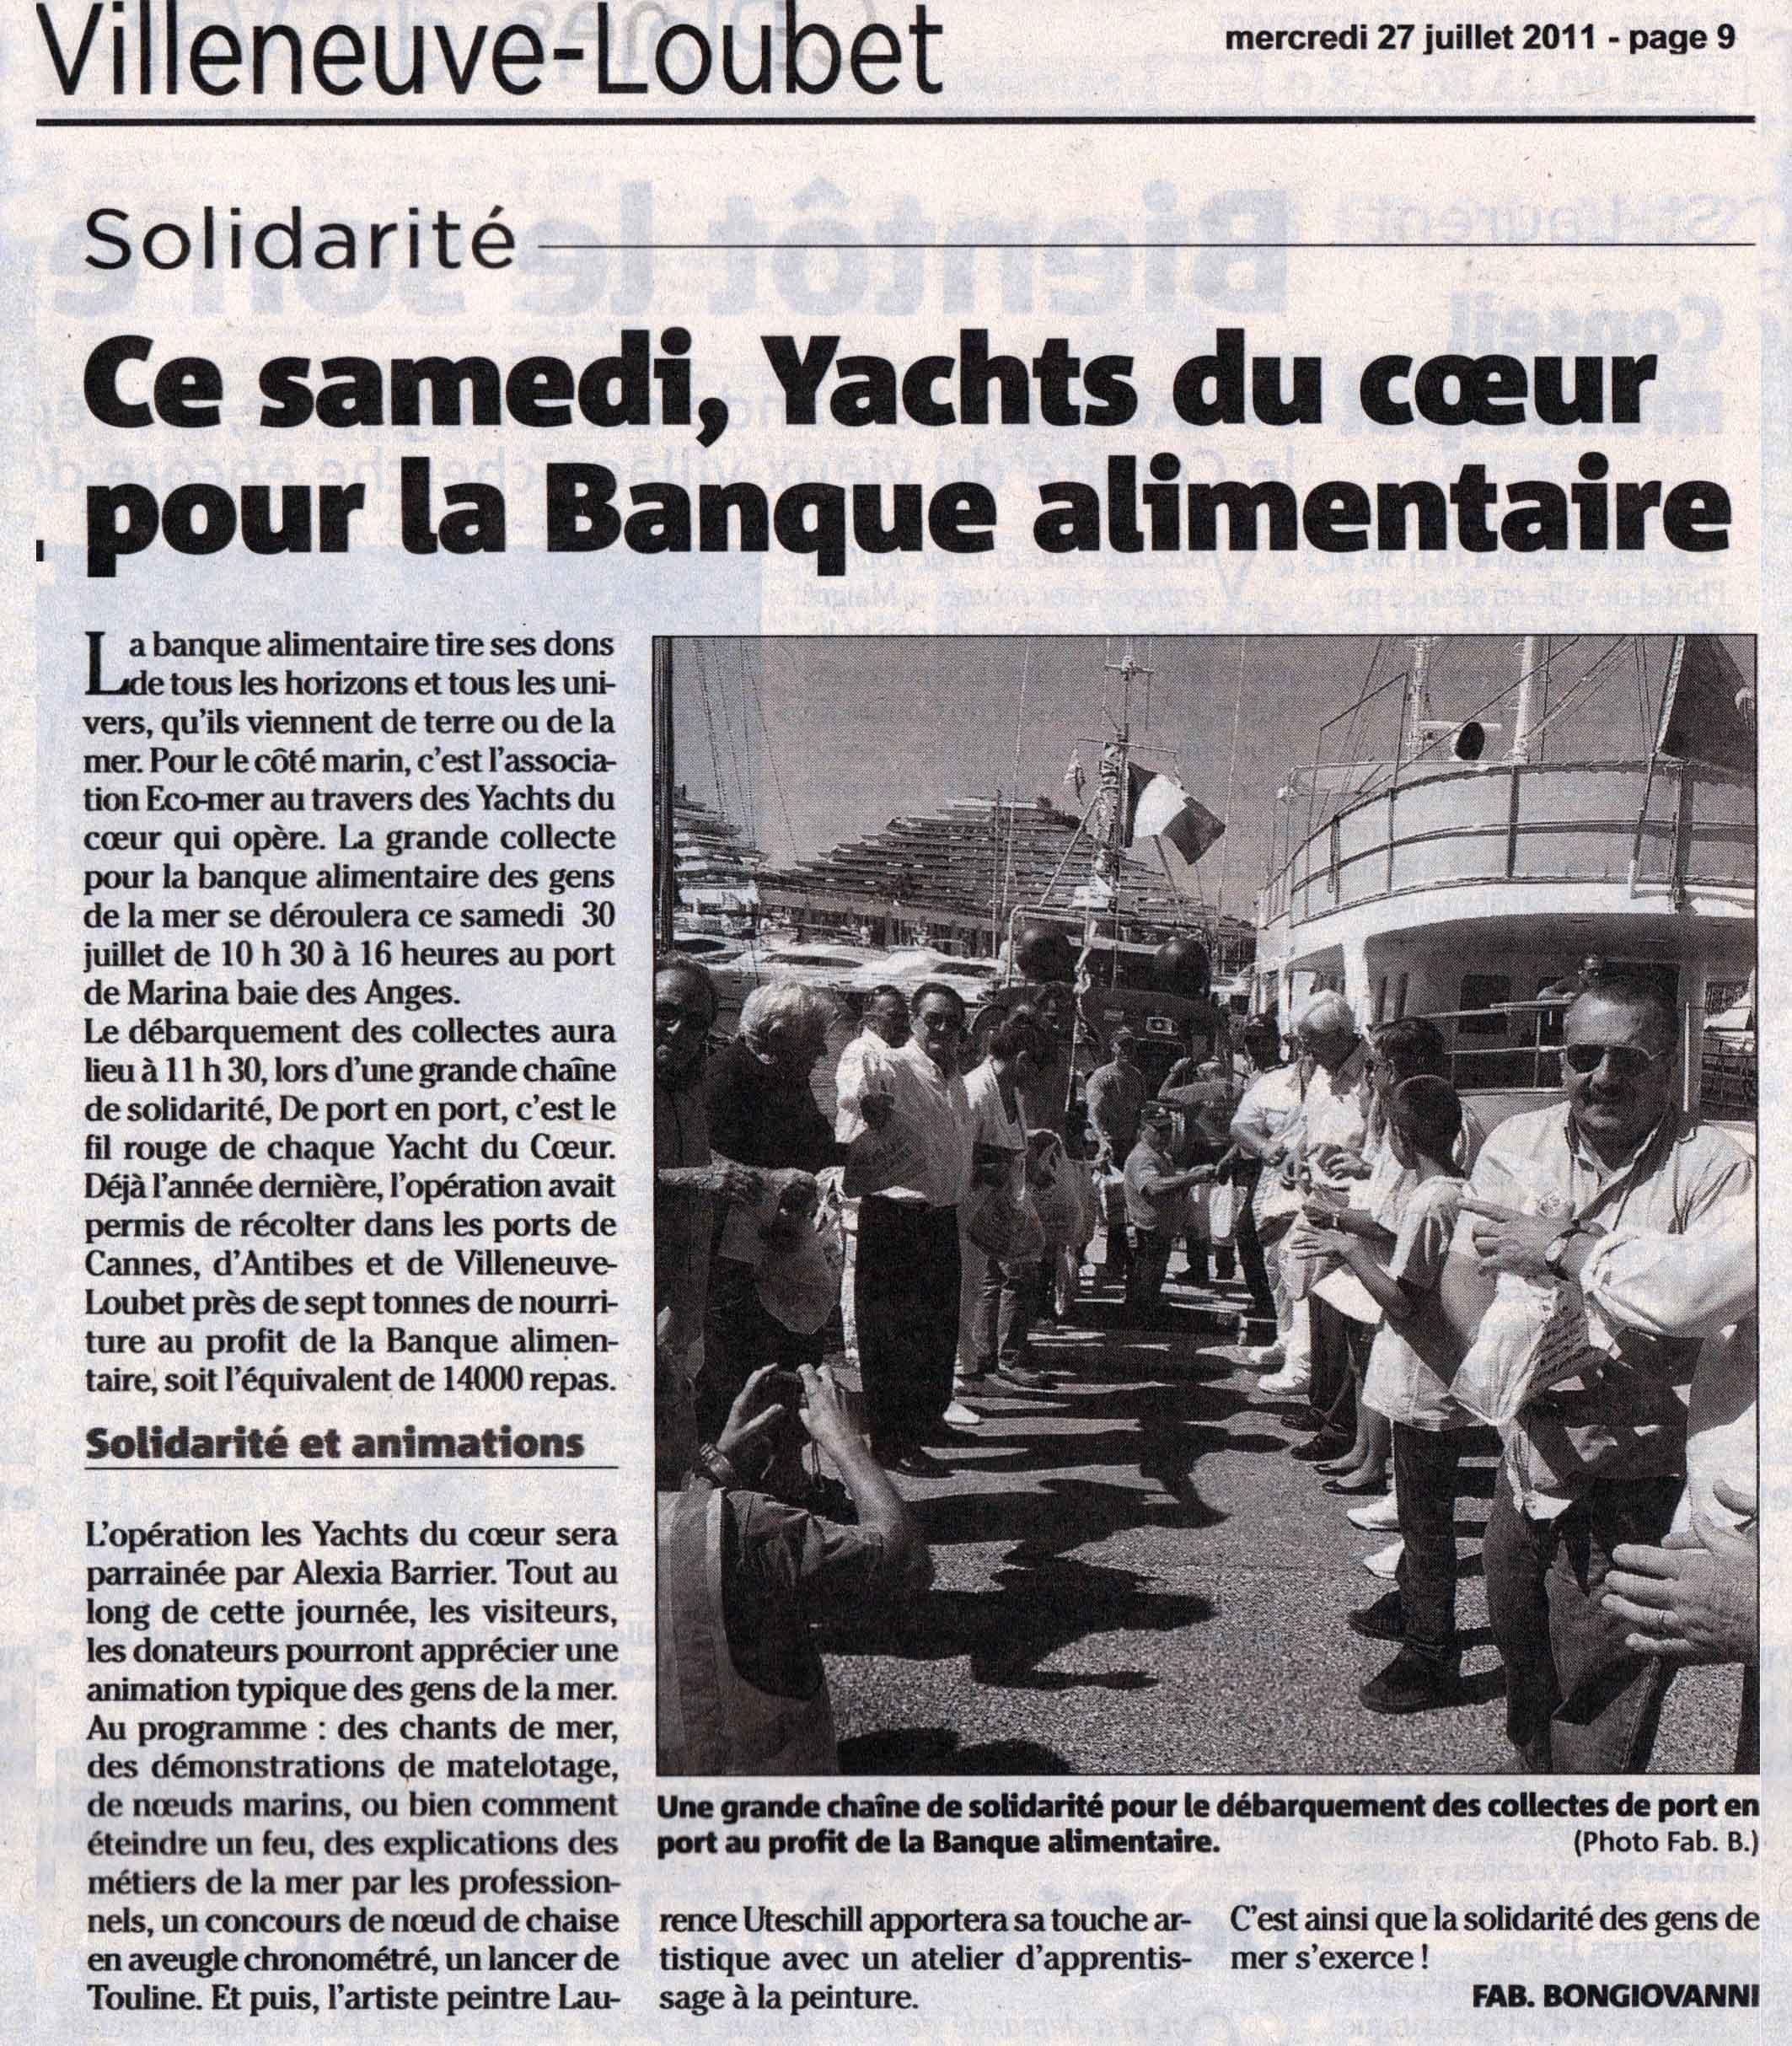 ydc-villeneuve-loubet-2011